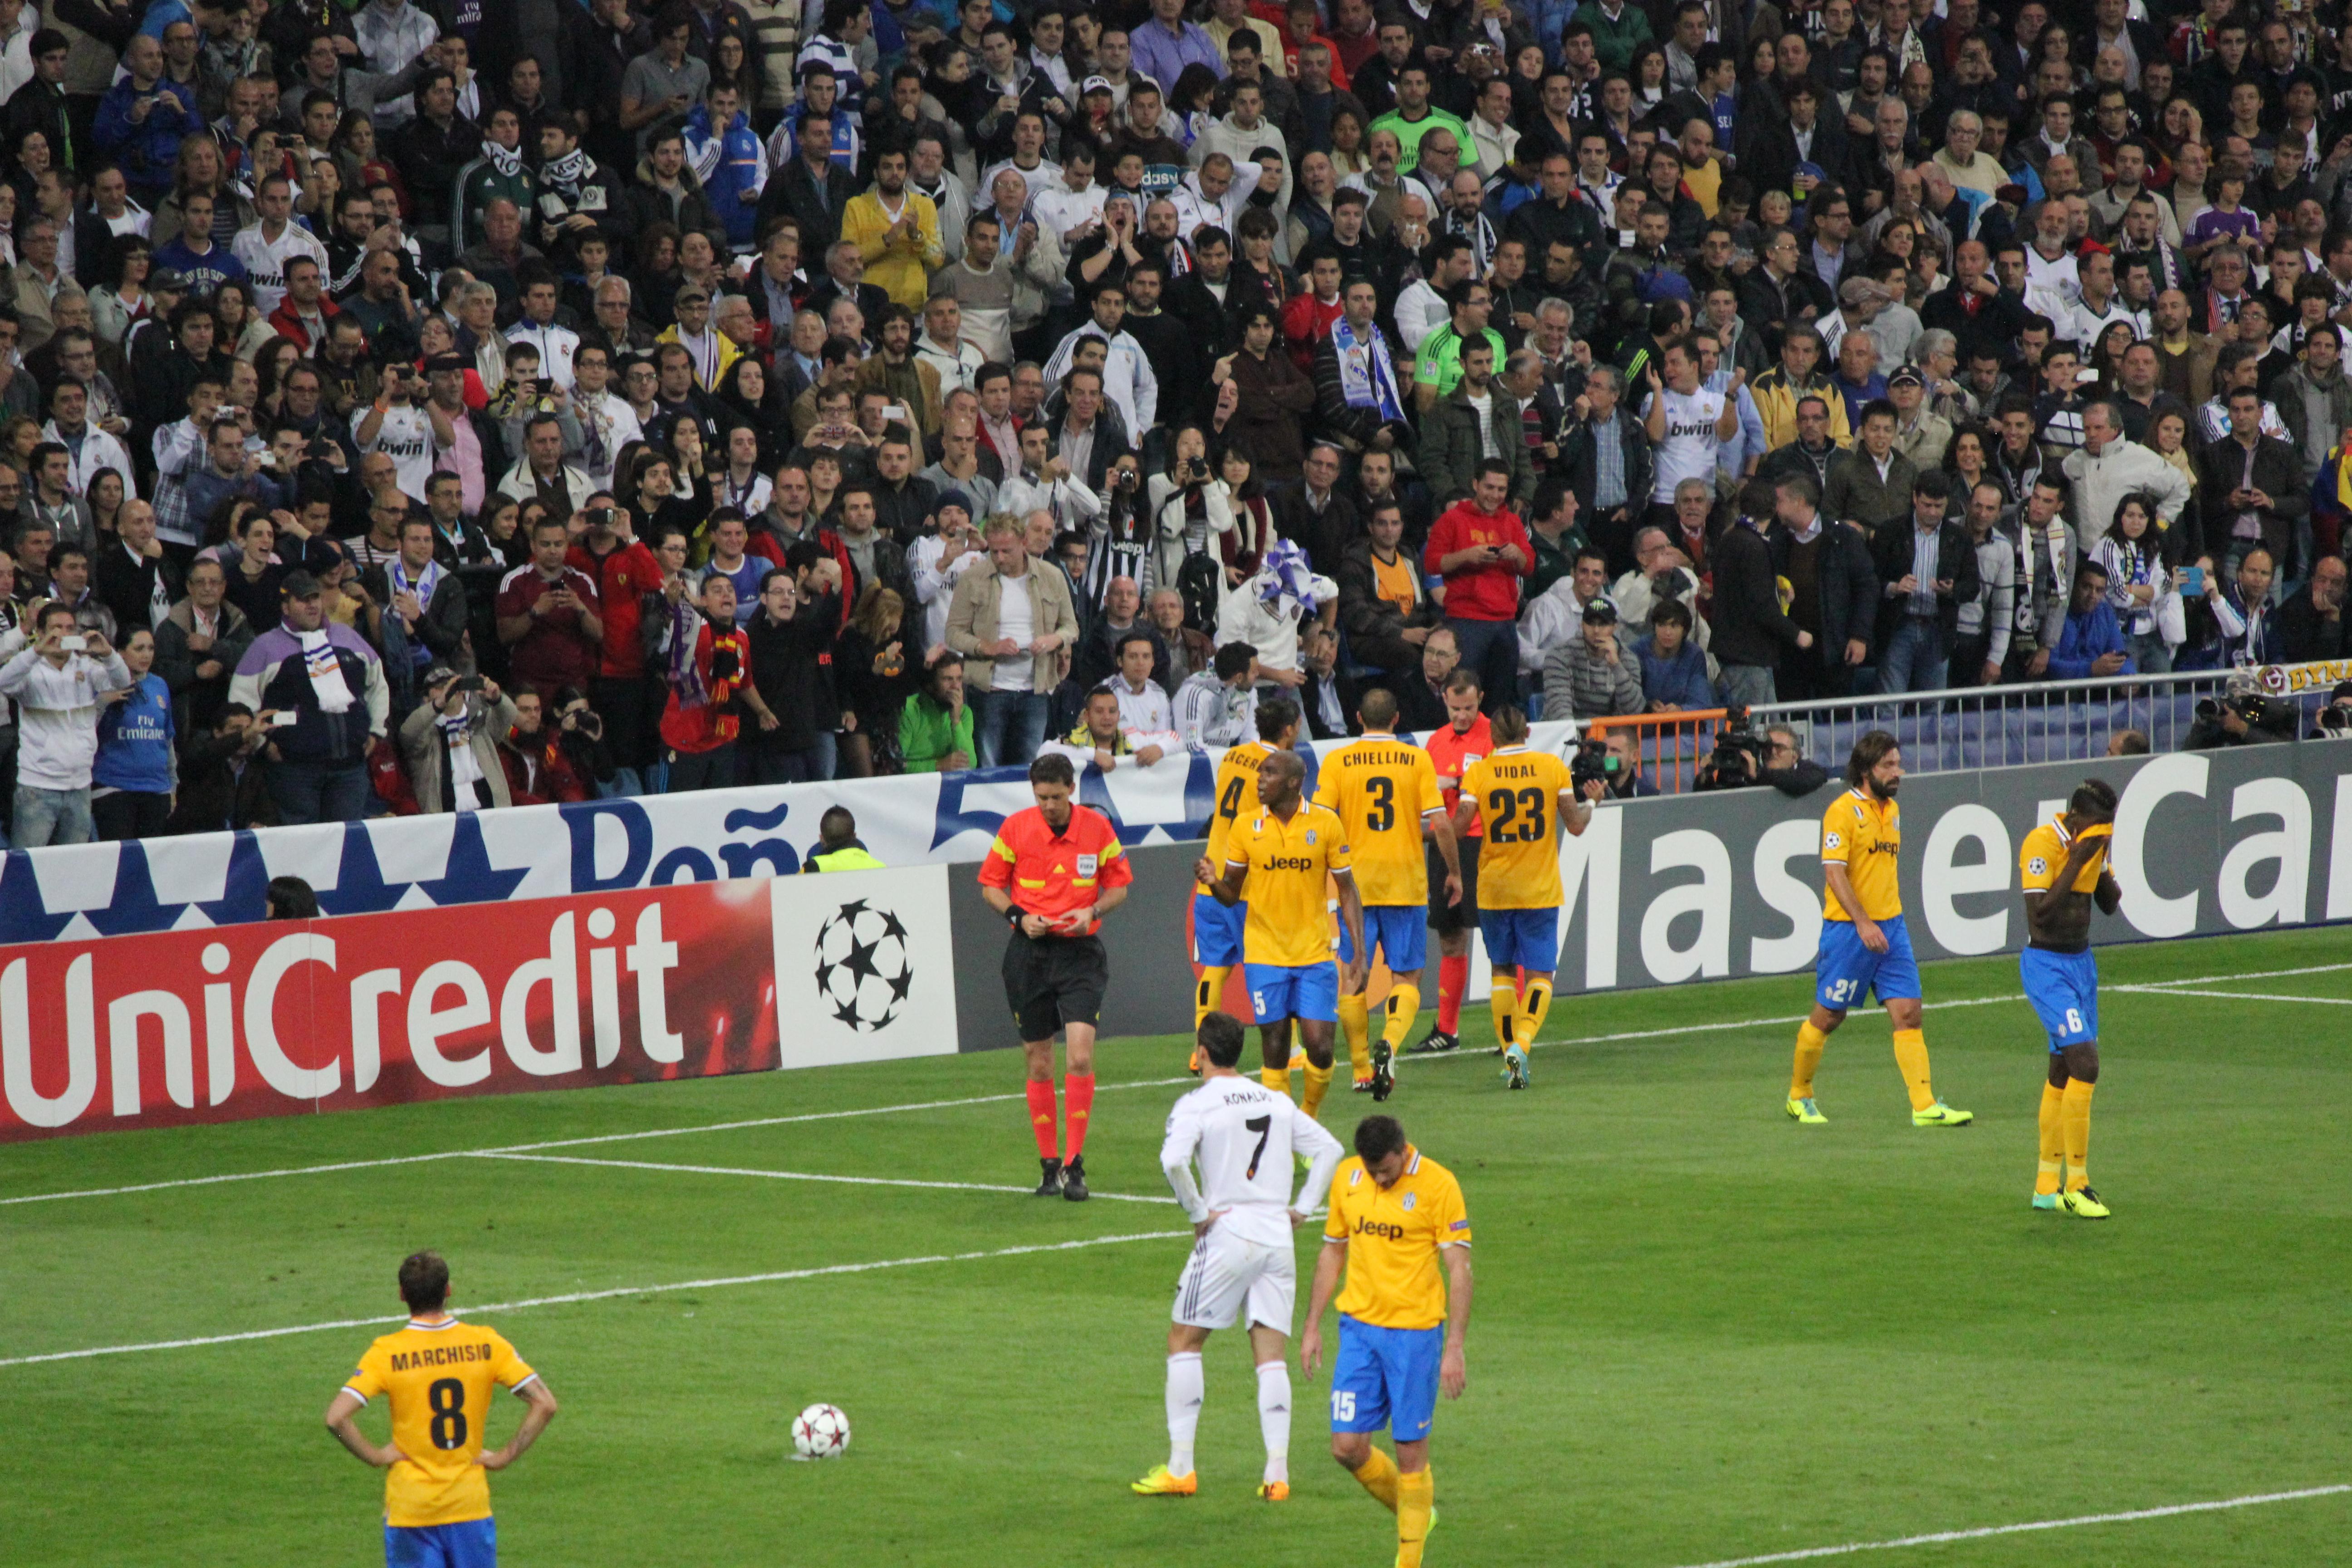 Image Result For Manchester United Vs Sevilla En Vivo Online Highlights